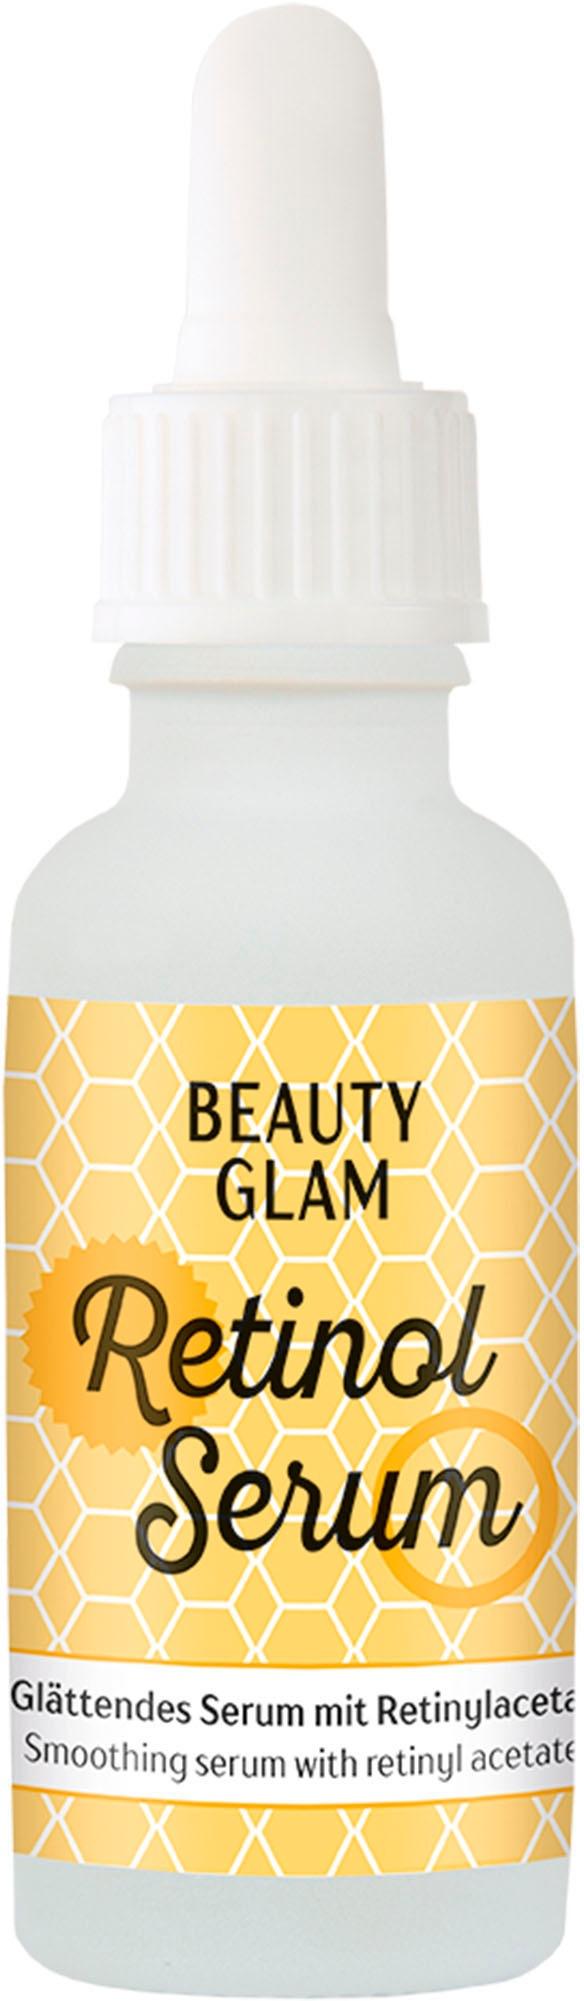 beauty glam -  Gesichtspflege-Set Vitamin Duo, (2 tlg.)